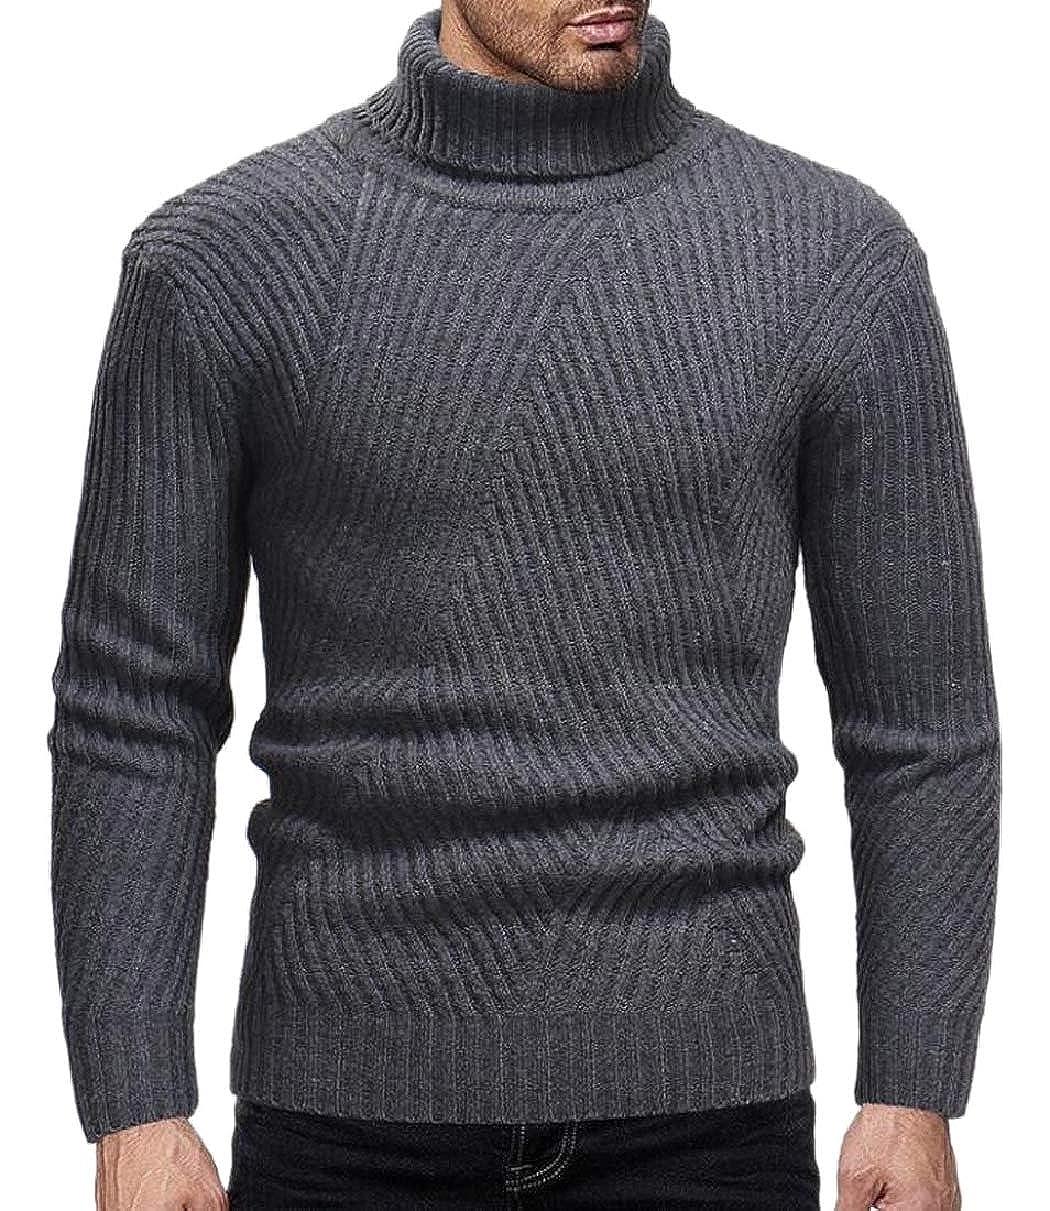 ZXFHZS Men Pullover Fall Winter Chic Soft Turtle Neck Chevron Stripes Knitting Sweater